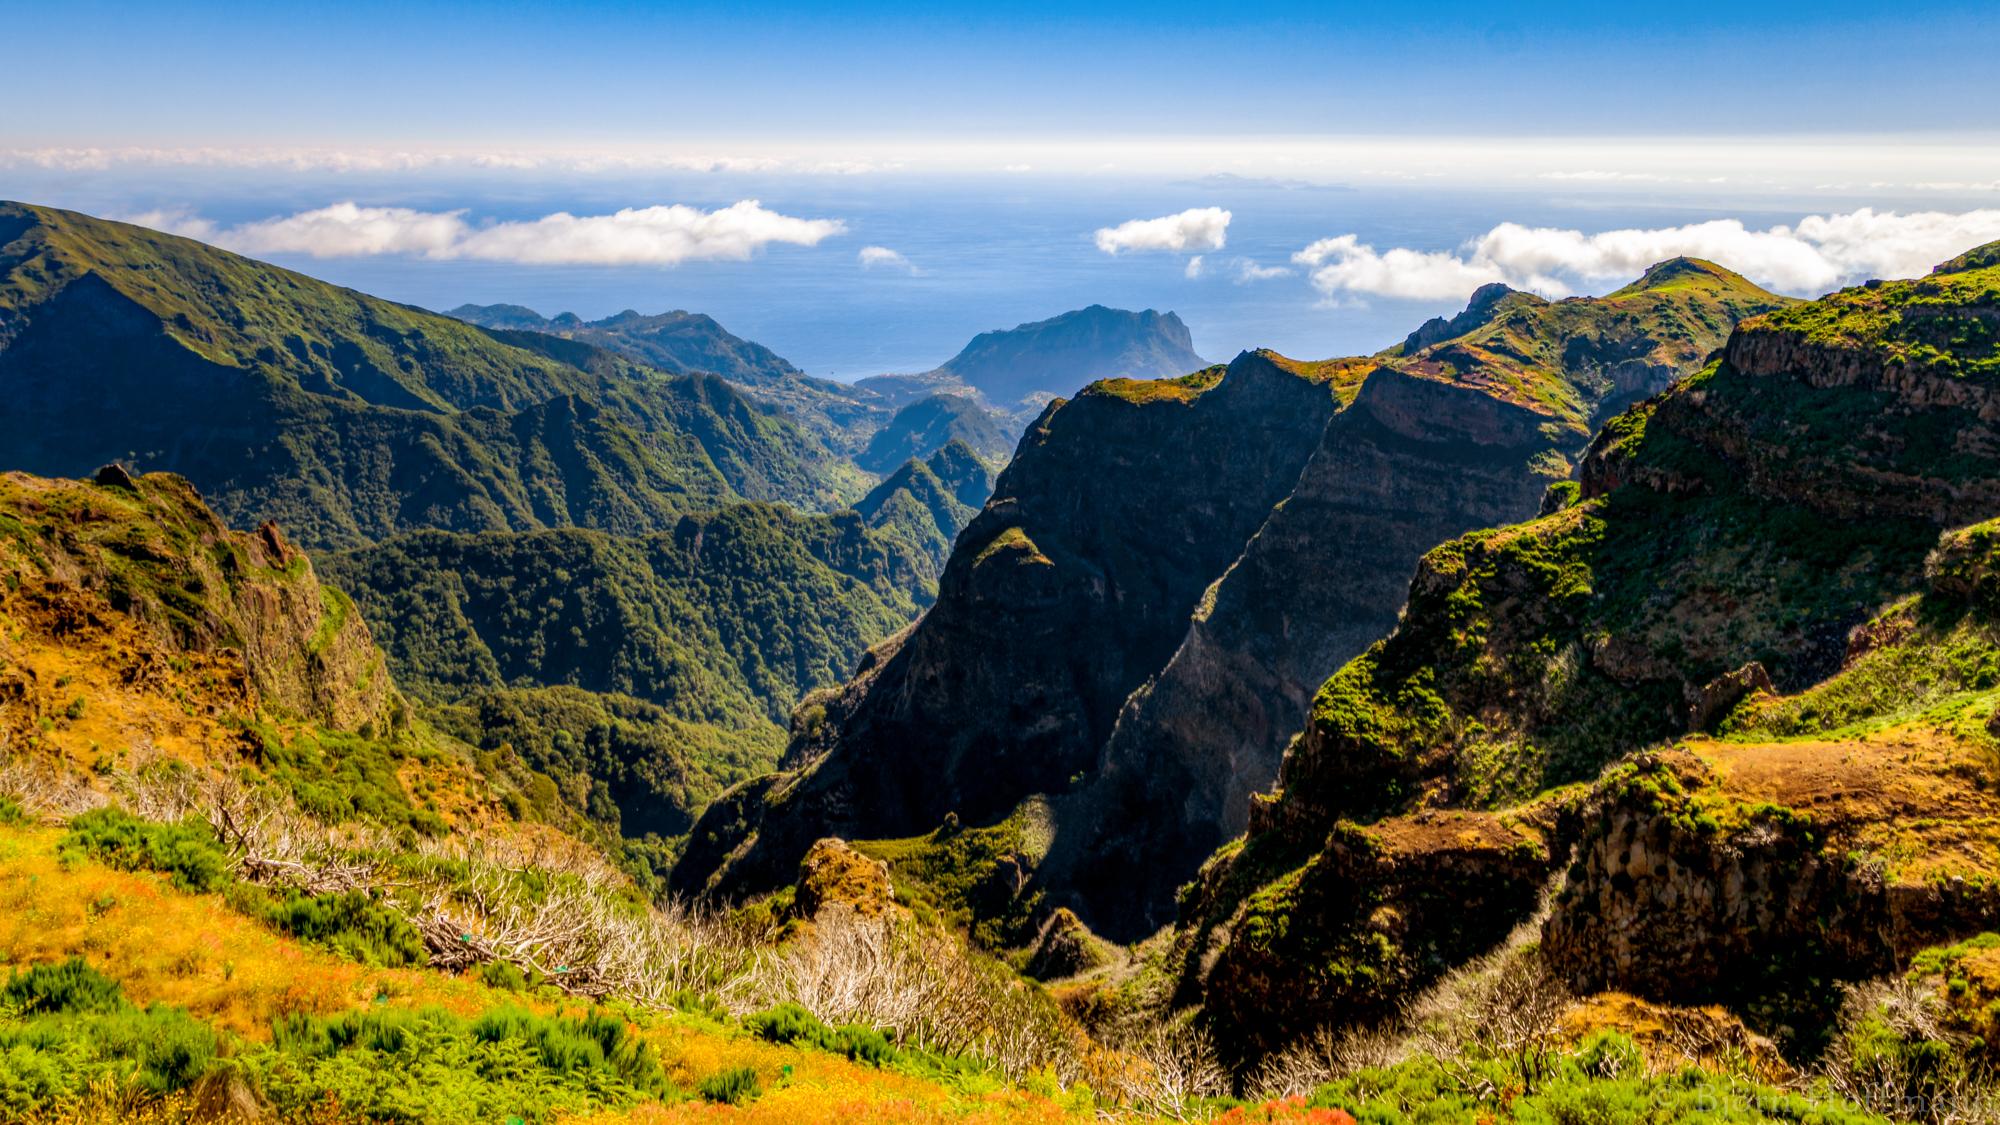 Madeira Mountains, Portugal